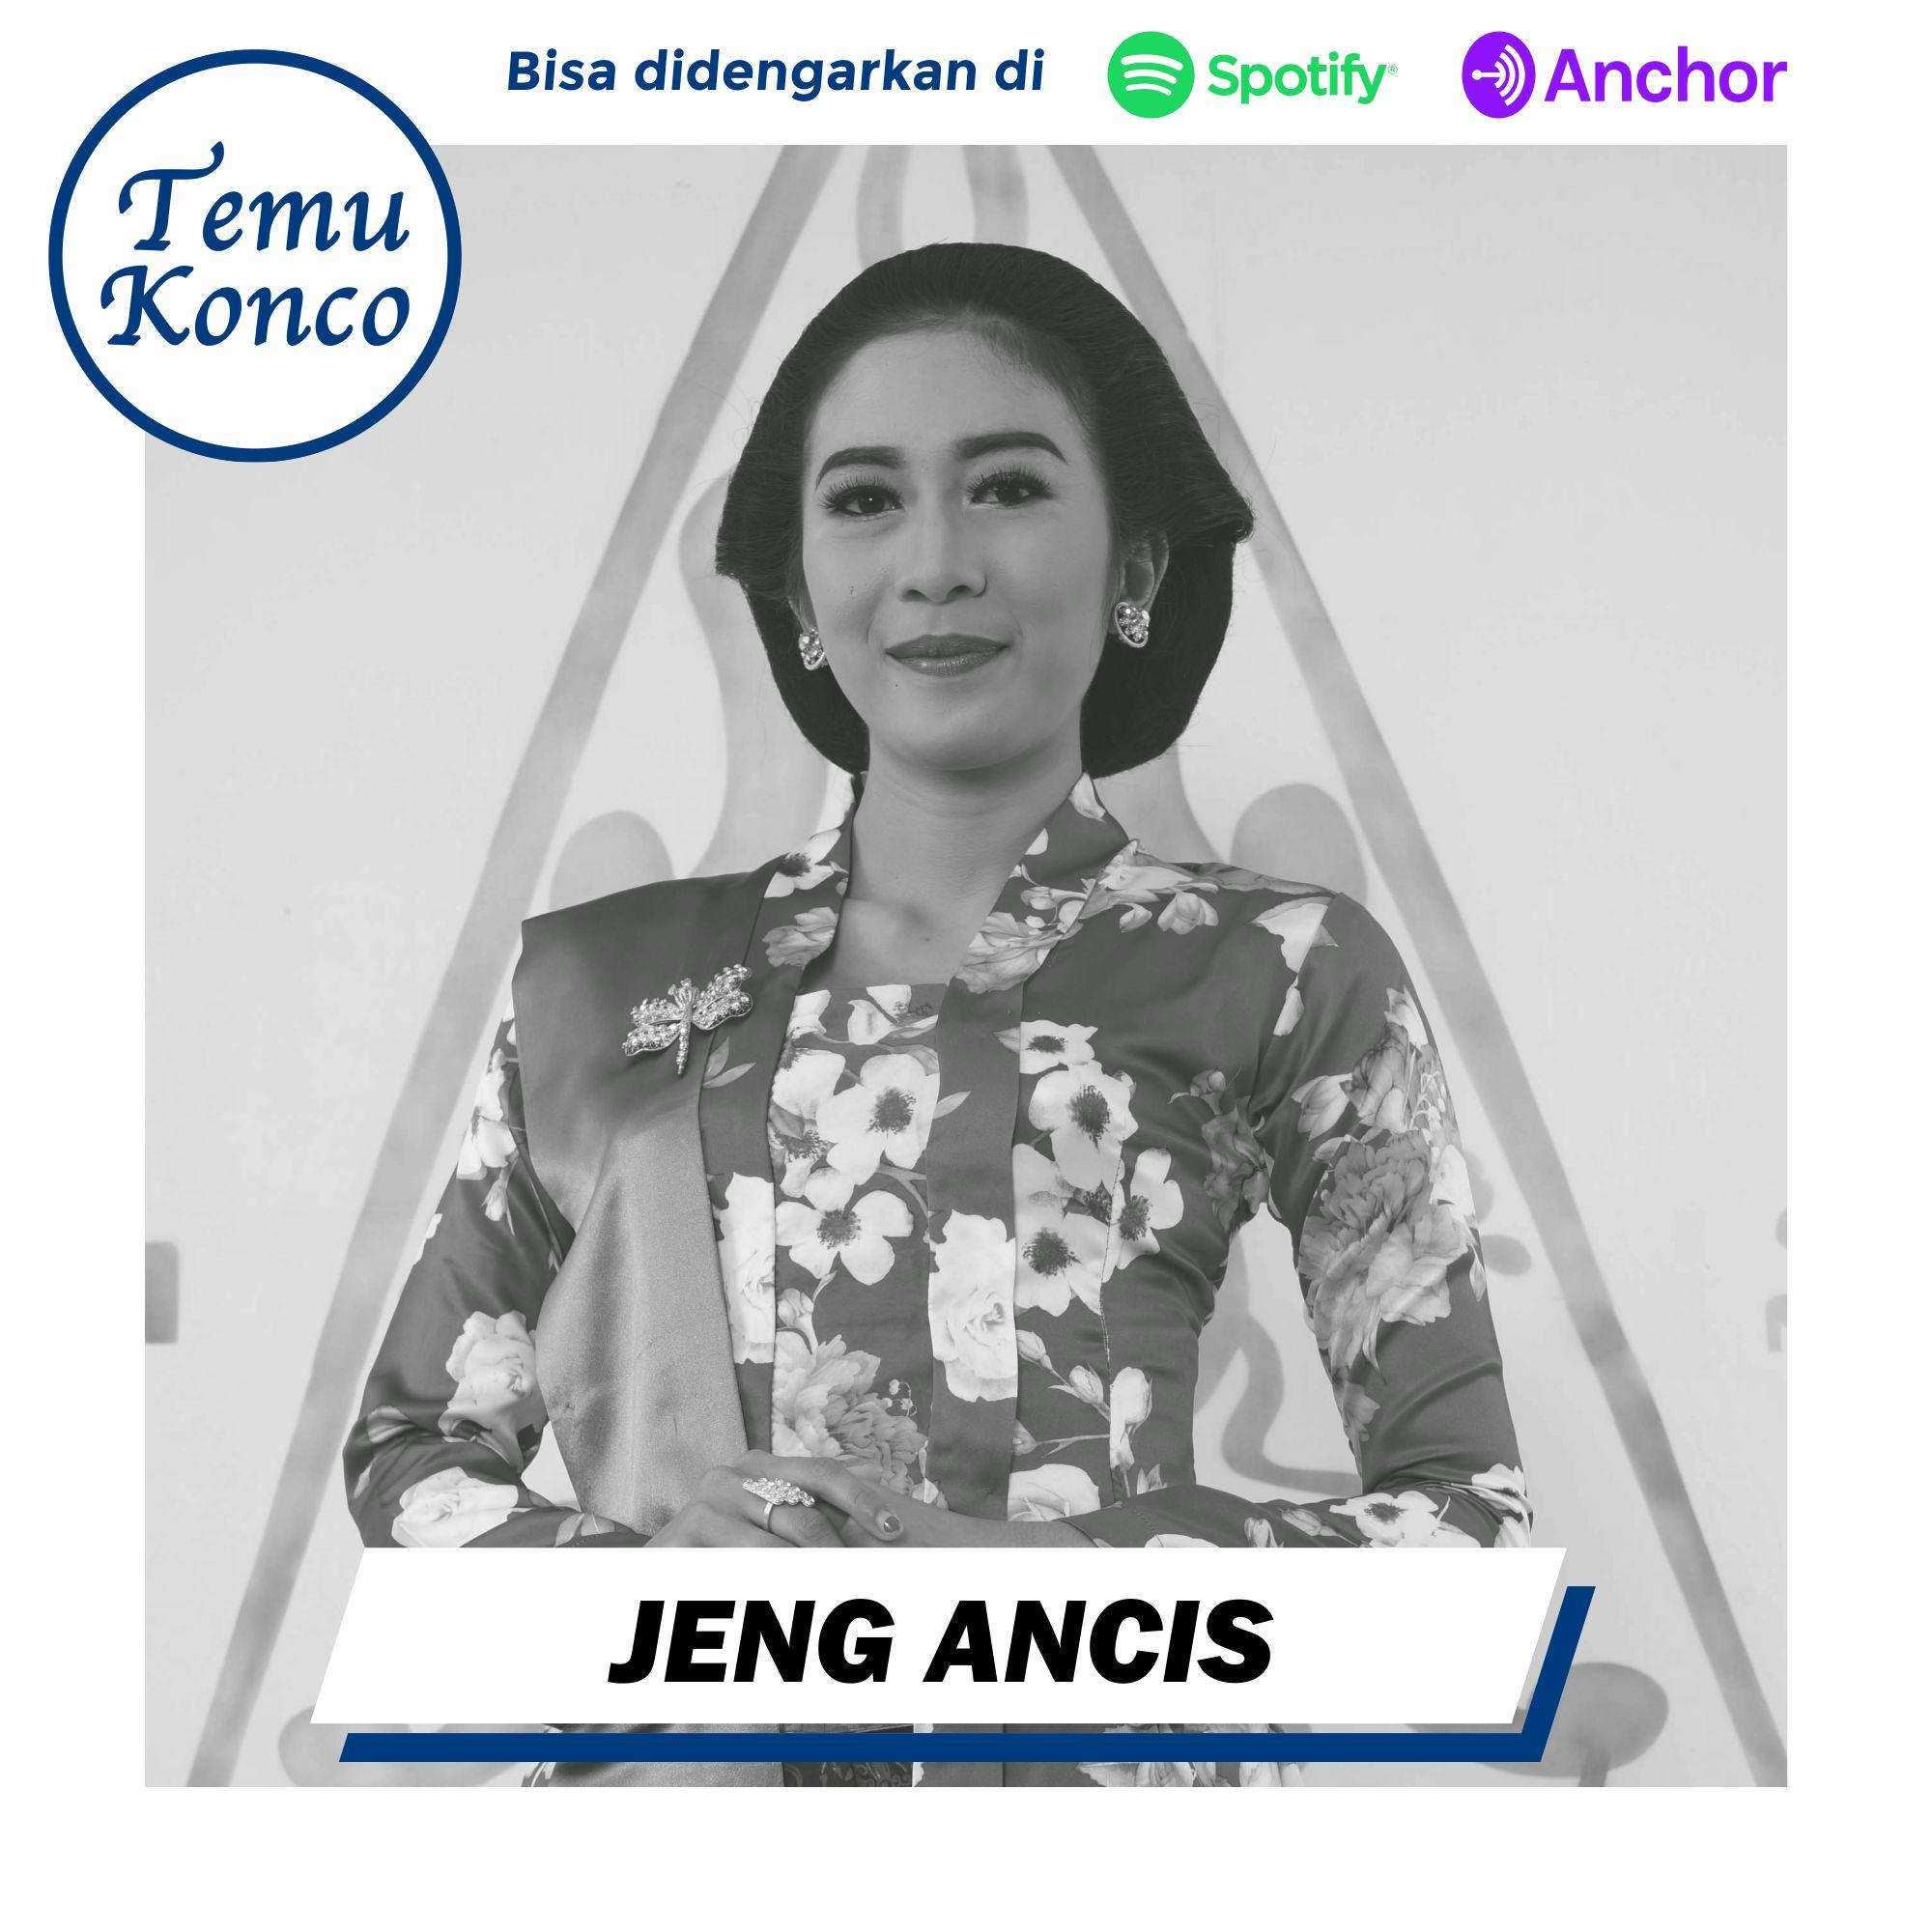 [TemuKonco Podcast Eps. 31] Jeng Ancis - Penari Istana